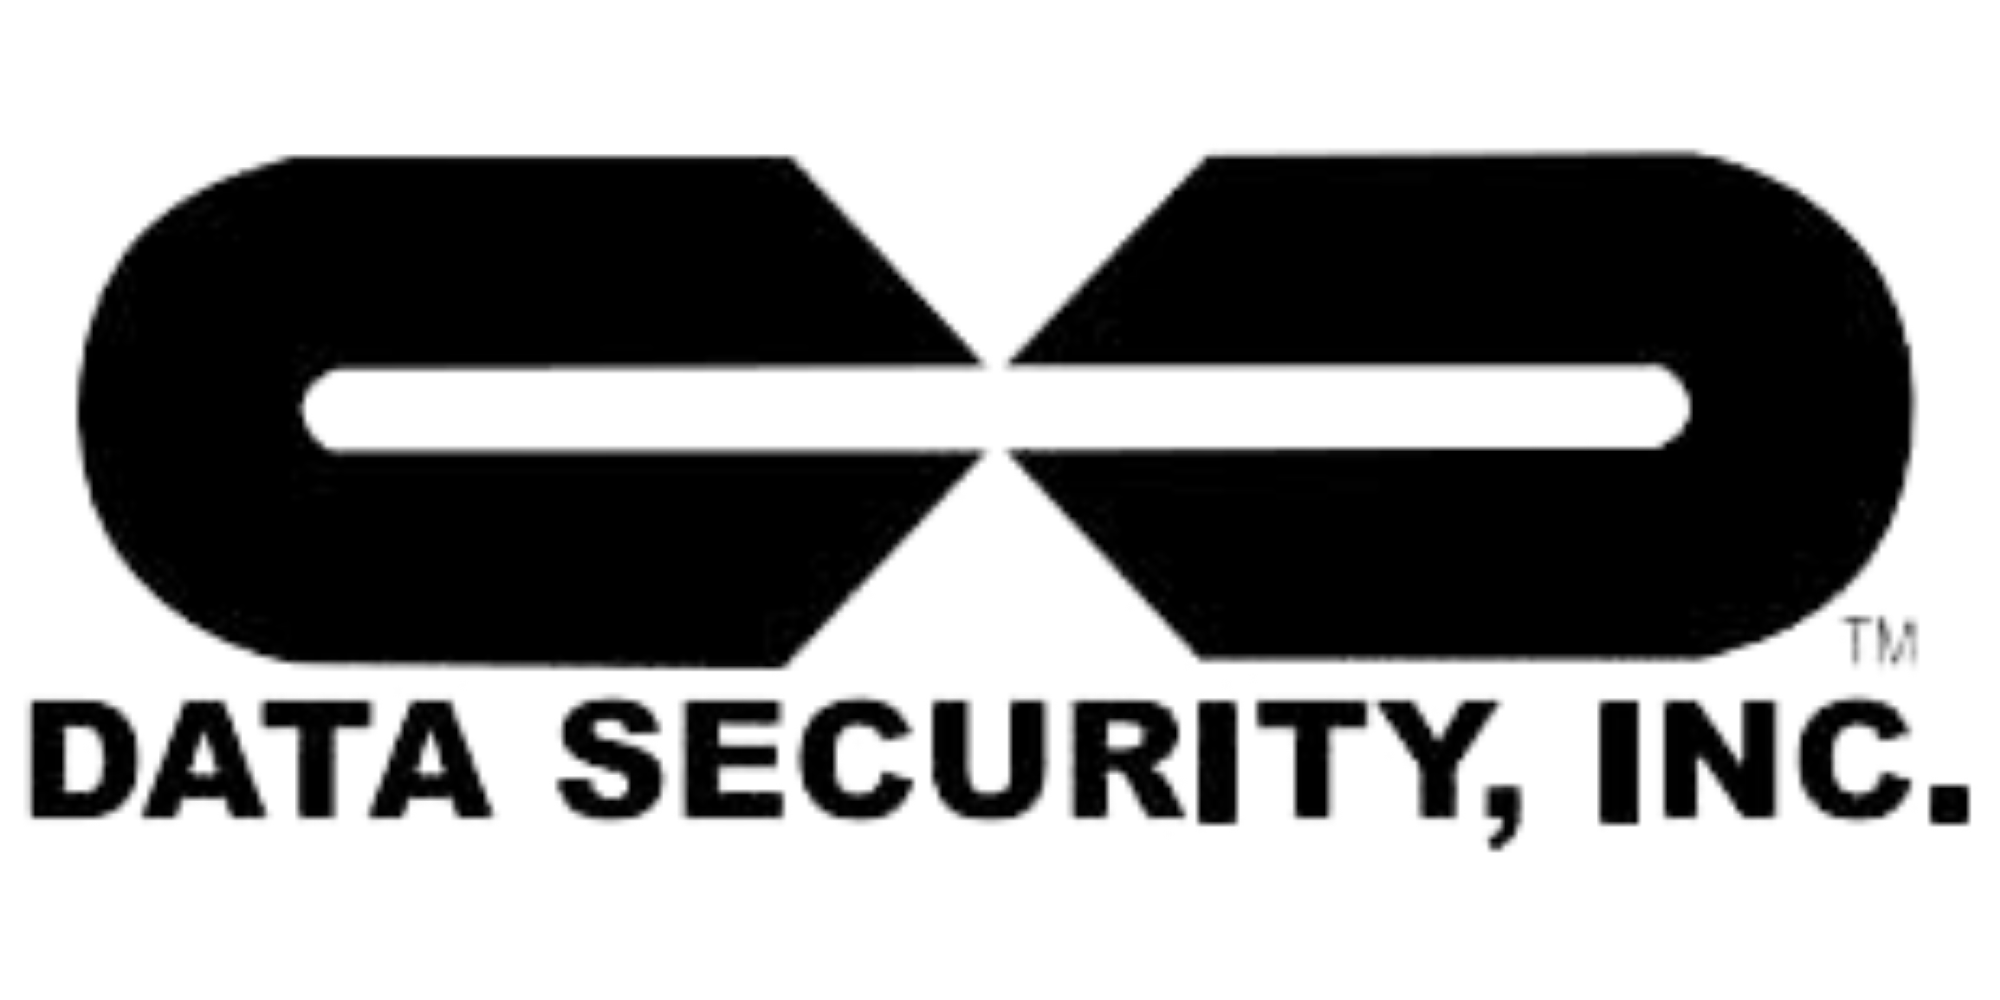 Data Security, Inc.